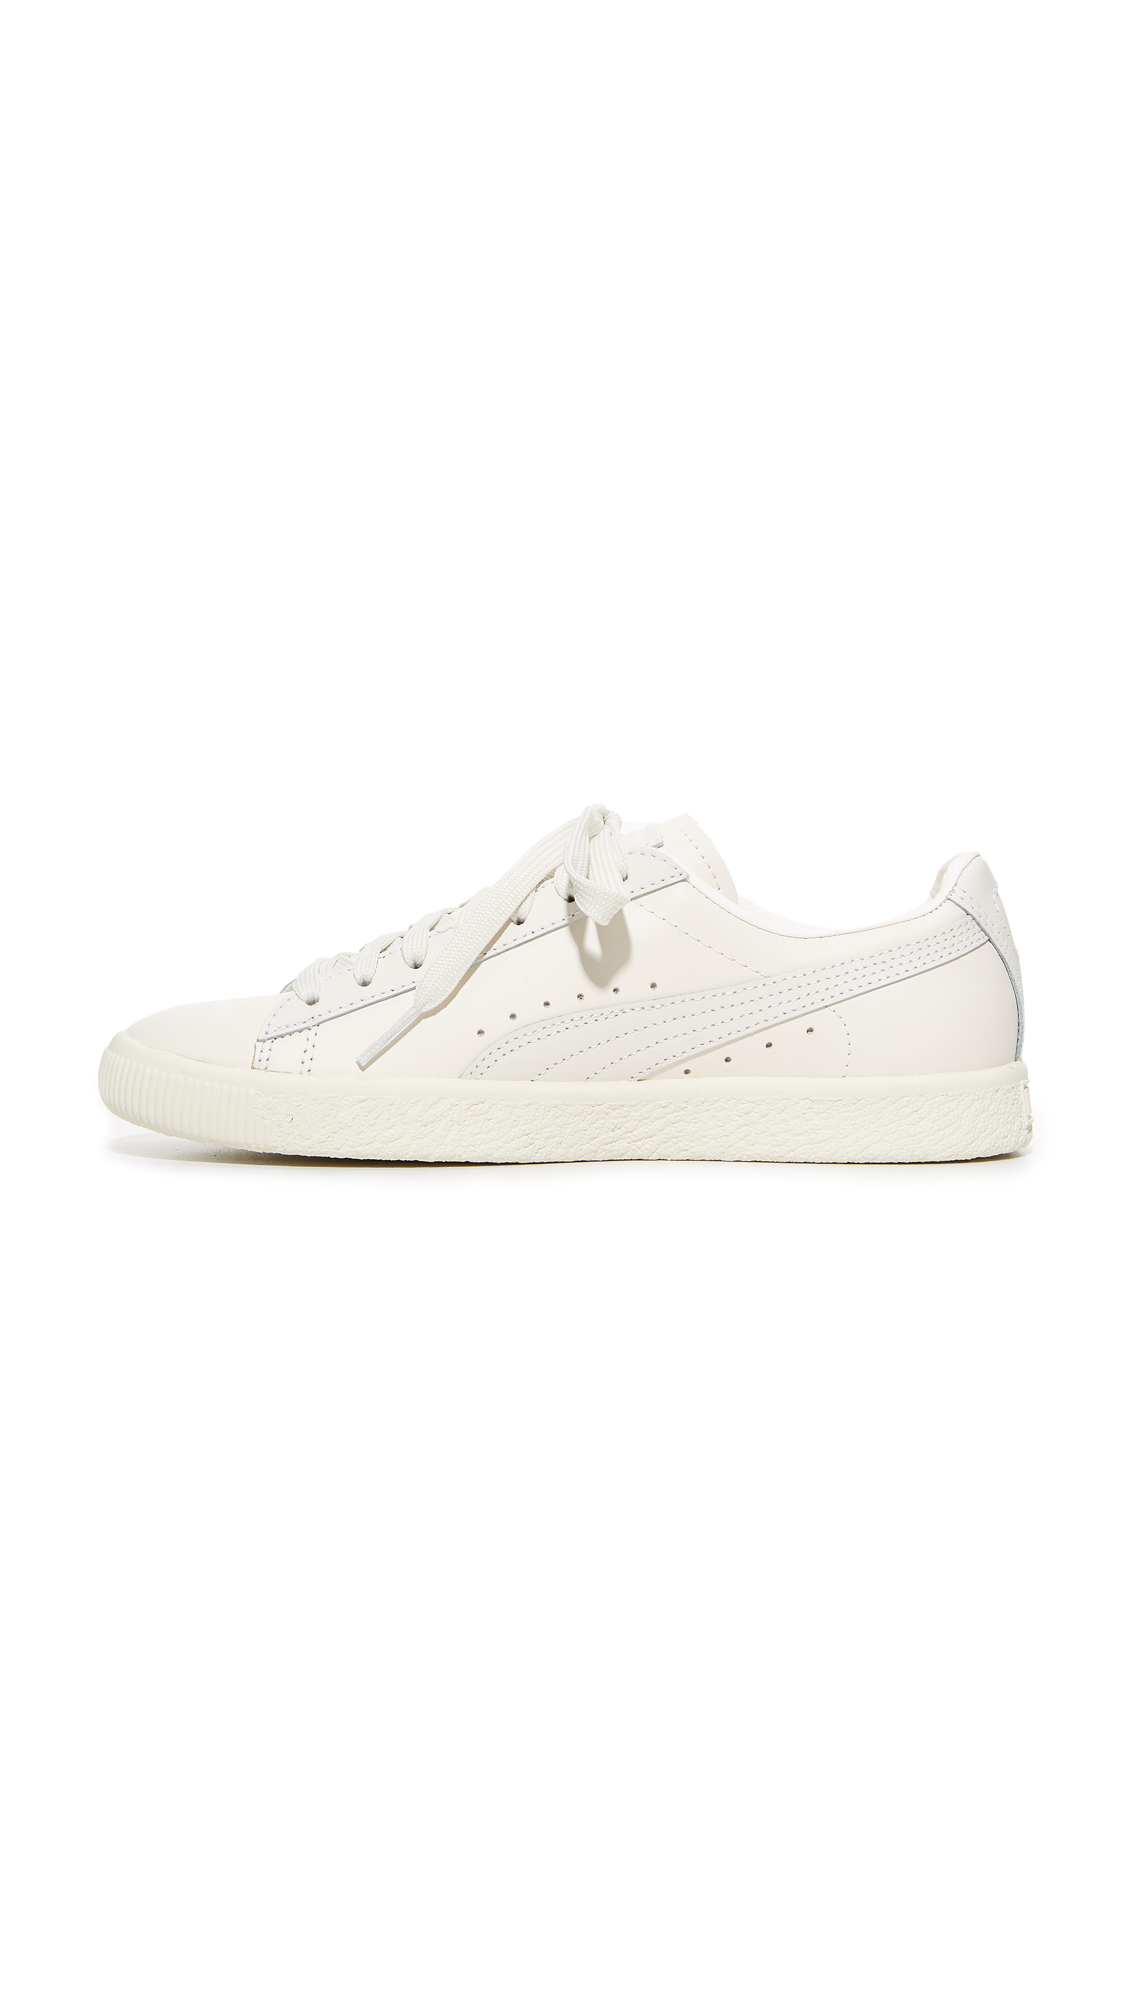 98e15ac46a0 PUMA Clyde Natural Sneakers